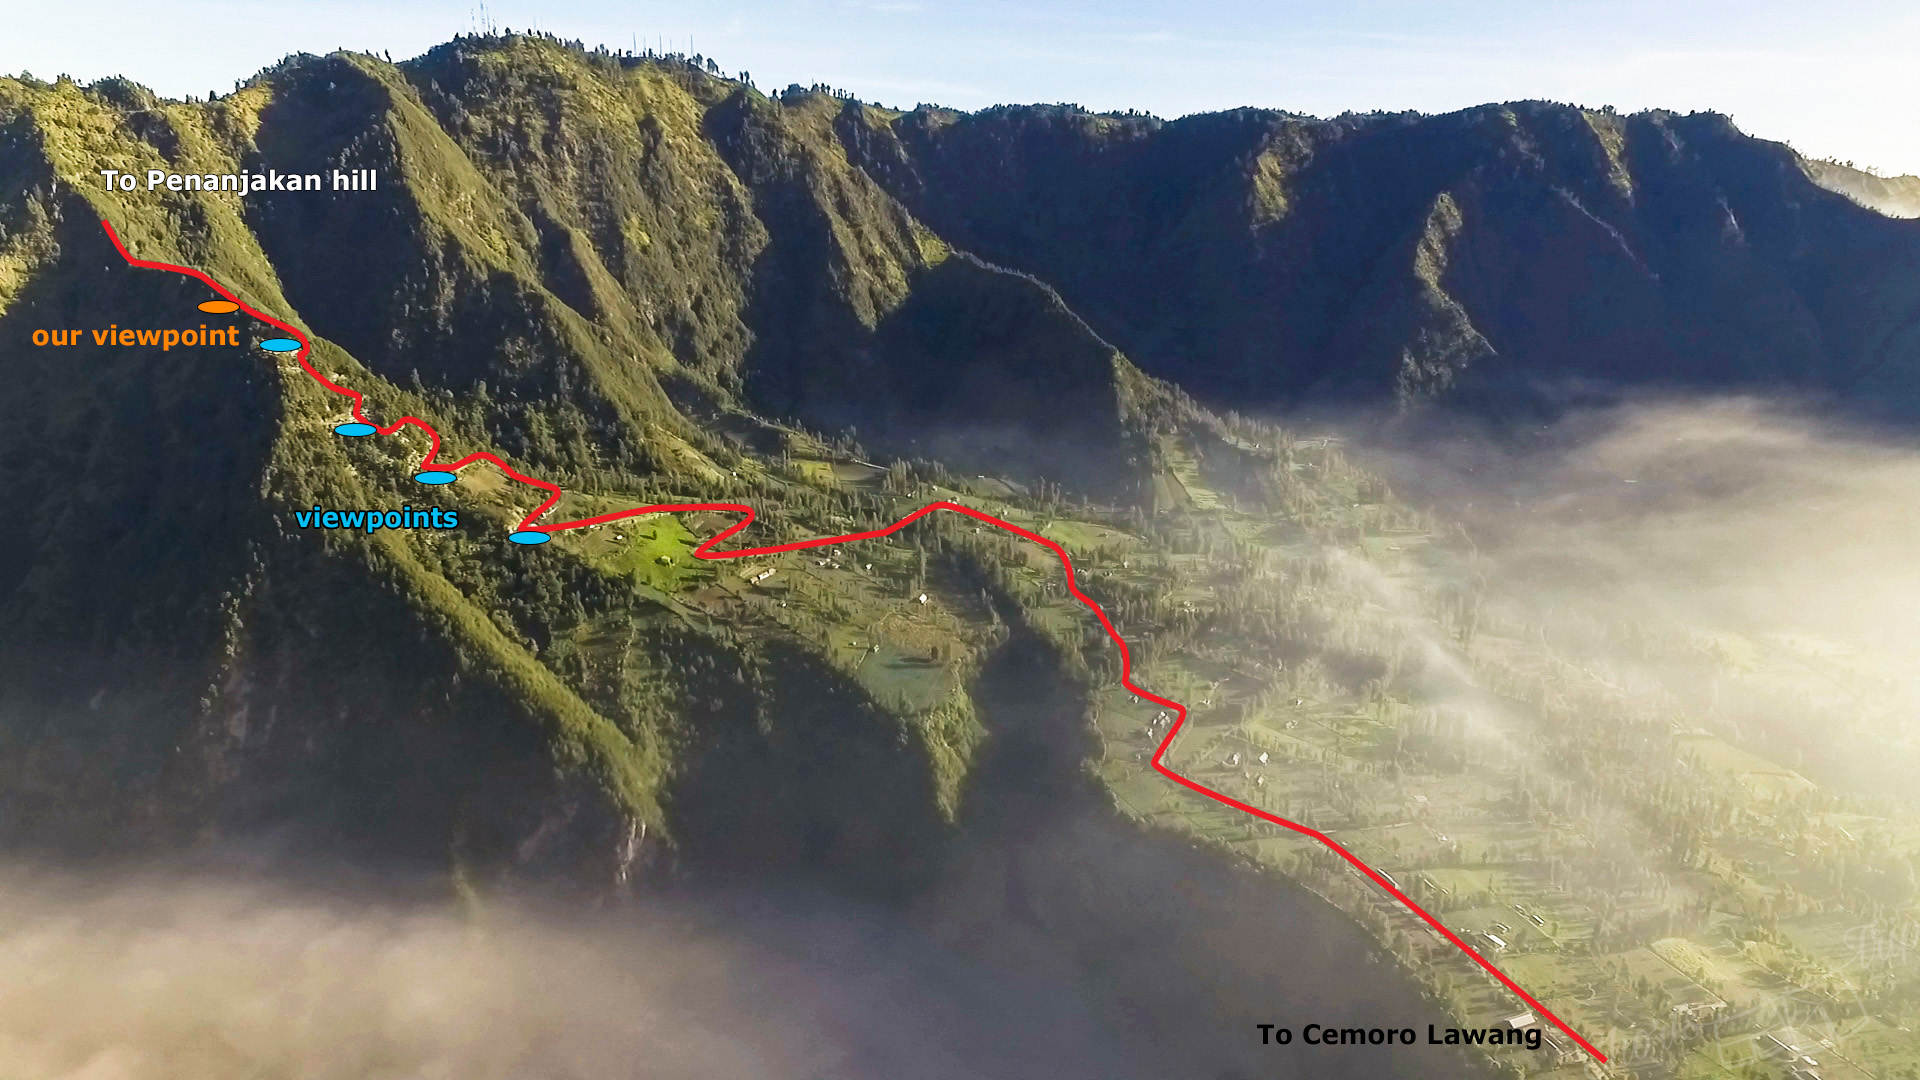 Смотровые площадки, бромо, карта бромо, чеморо лаванг, кальдера, кальдера бромо, бромо, вулкан бромо, индонезия, бромо индонезия